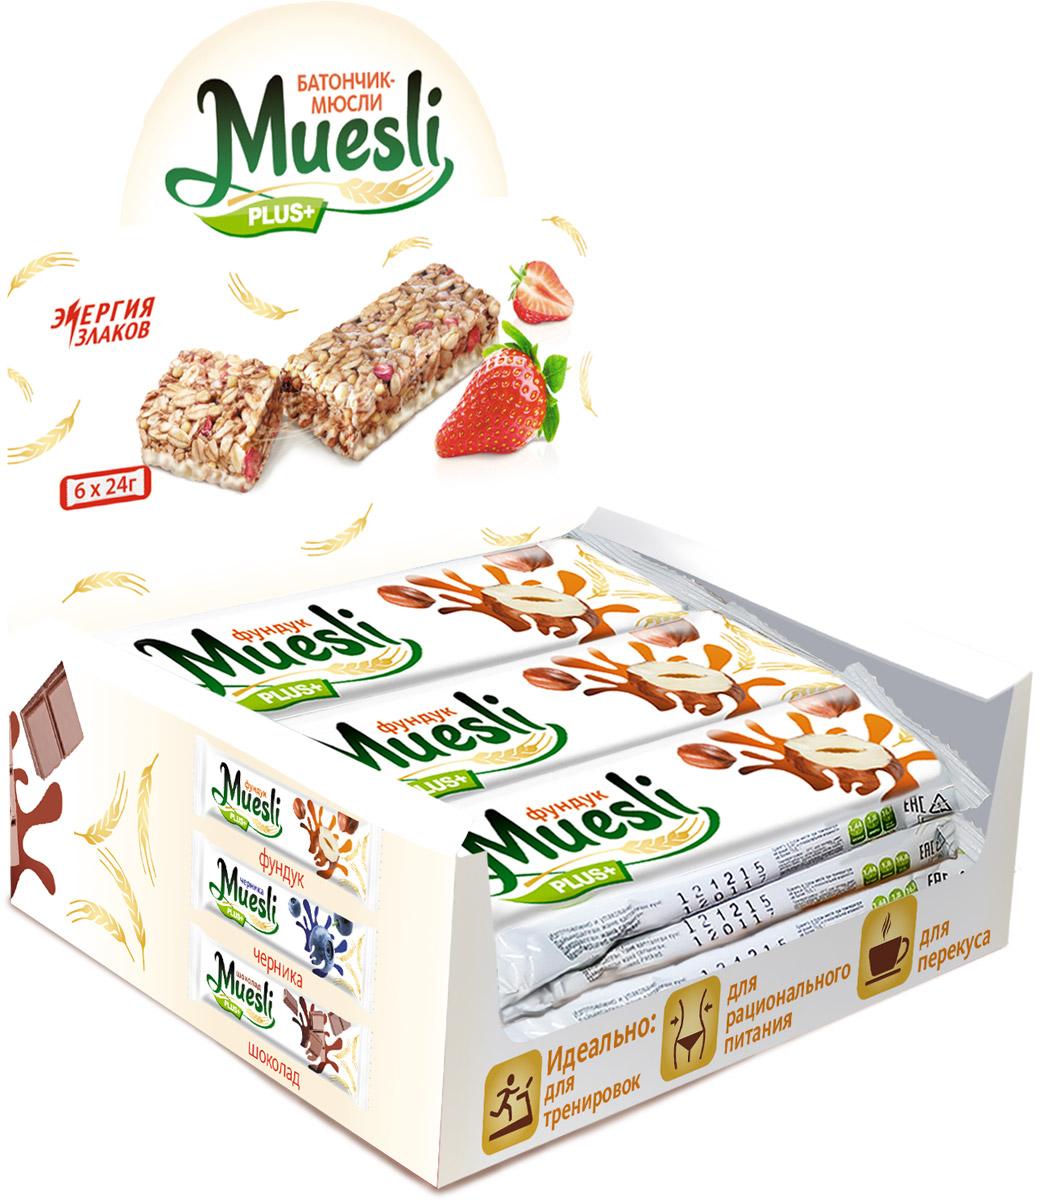 Matti Muesli Plus батончик мюсли ореховый микс, 6 шт по 24 г